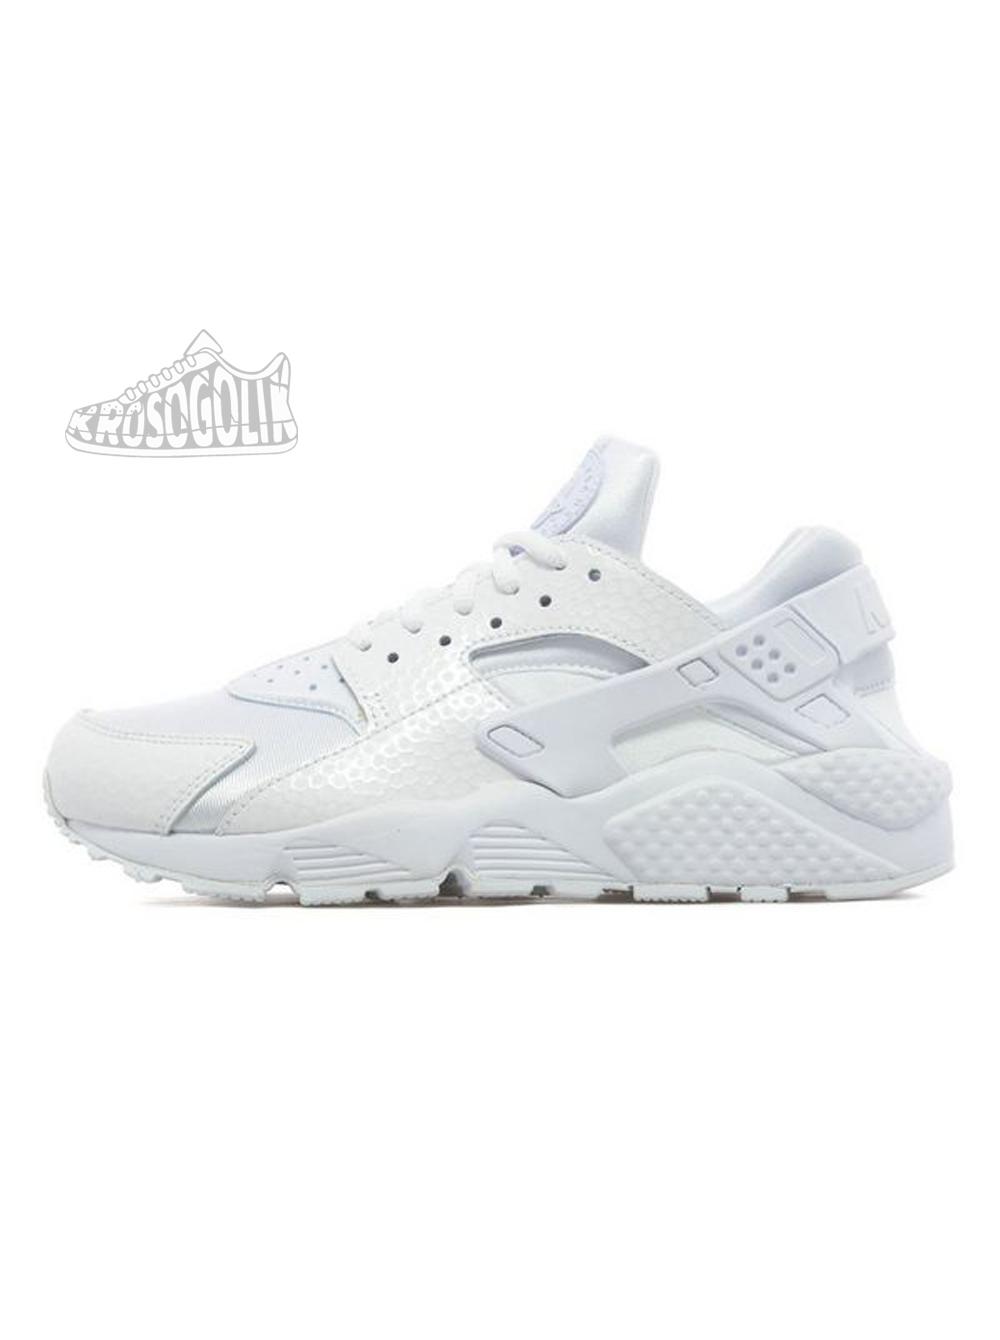 9d3df078 Купить женские кроссовки Nike Air Huarache 1 Black White на ...